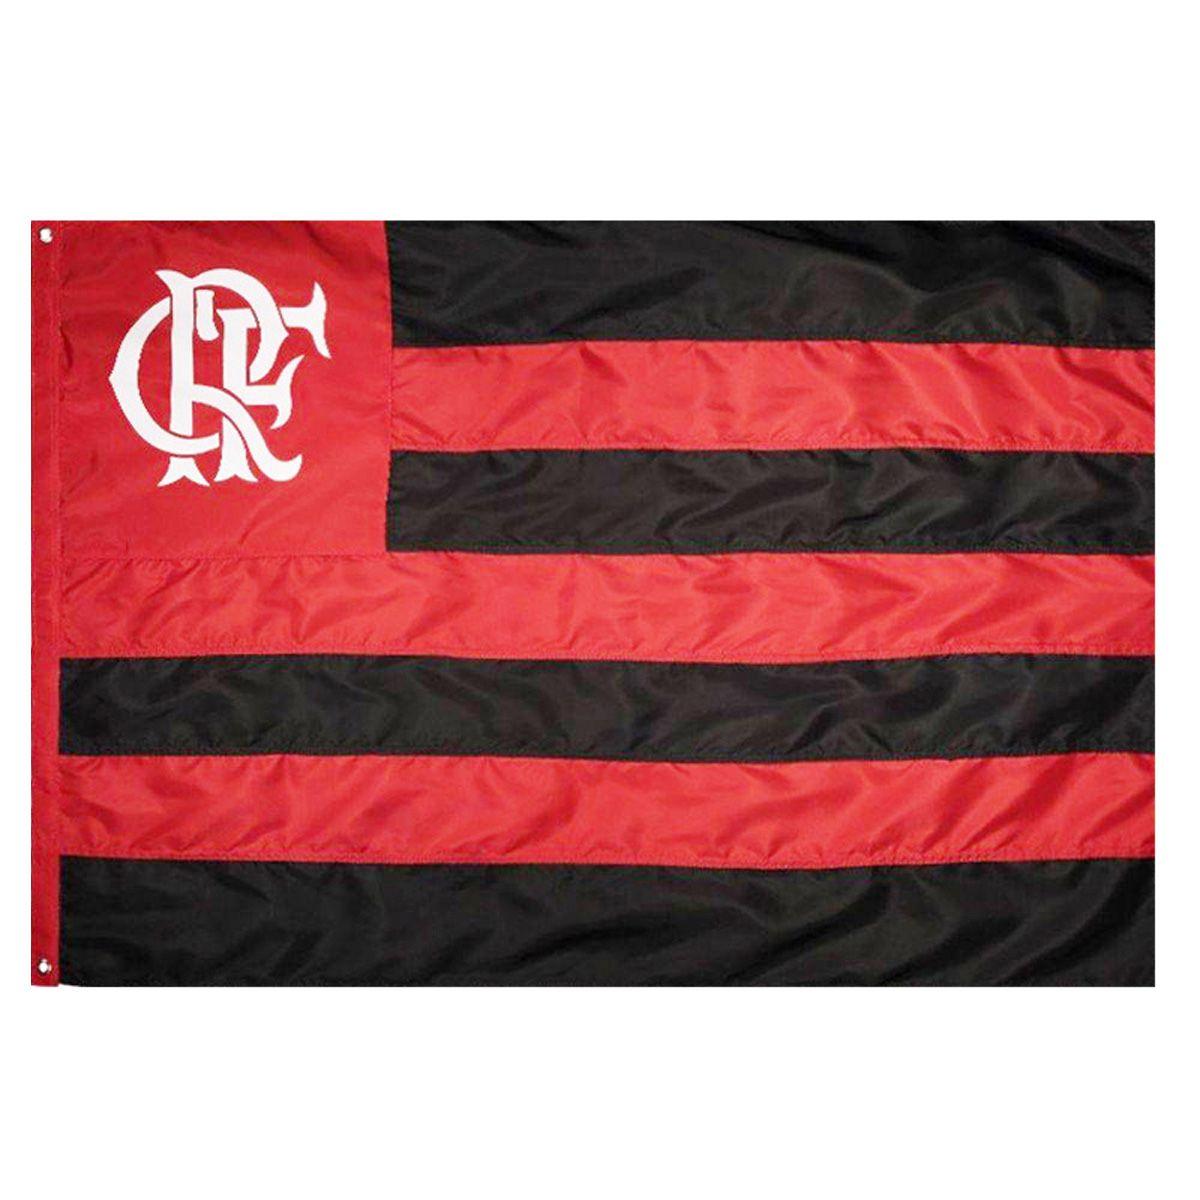 Bandeira Oficial do Flamengo 64 x 45 cm - 1 pano